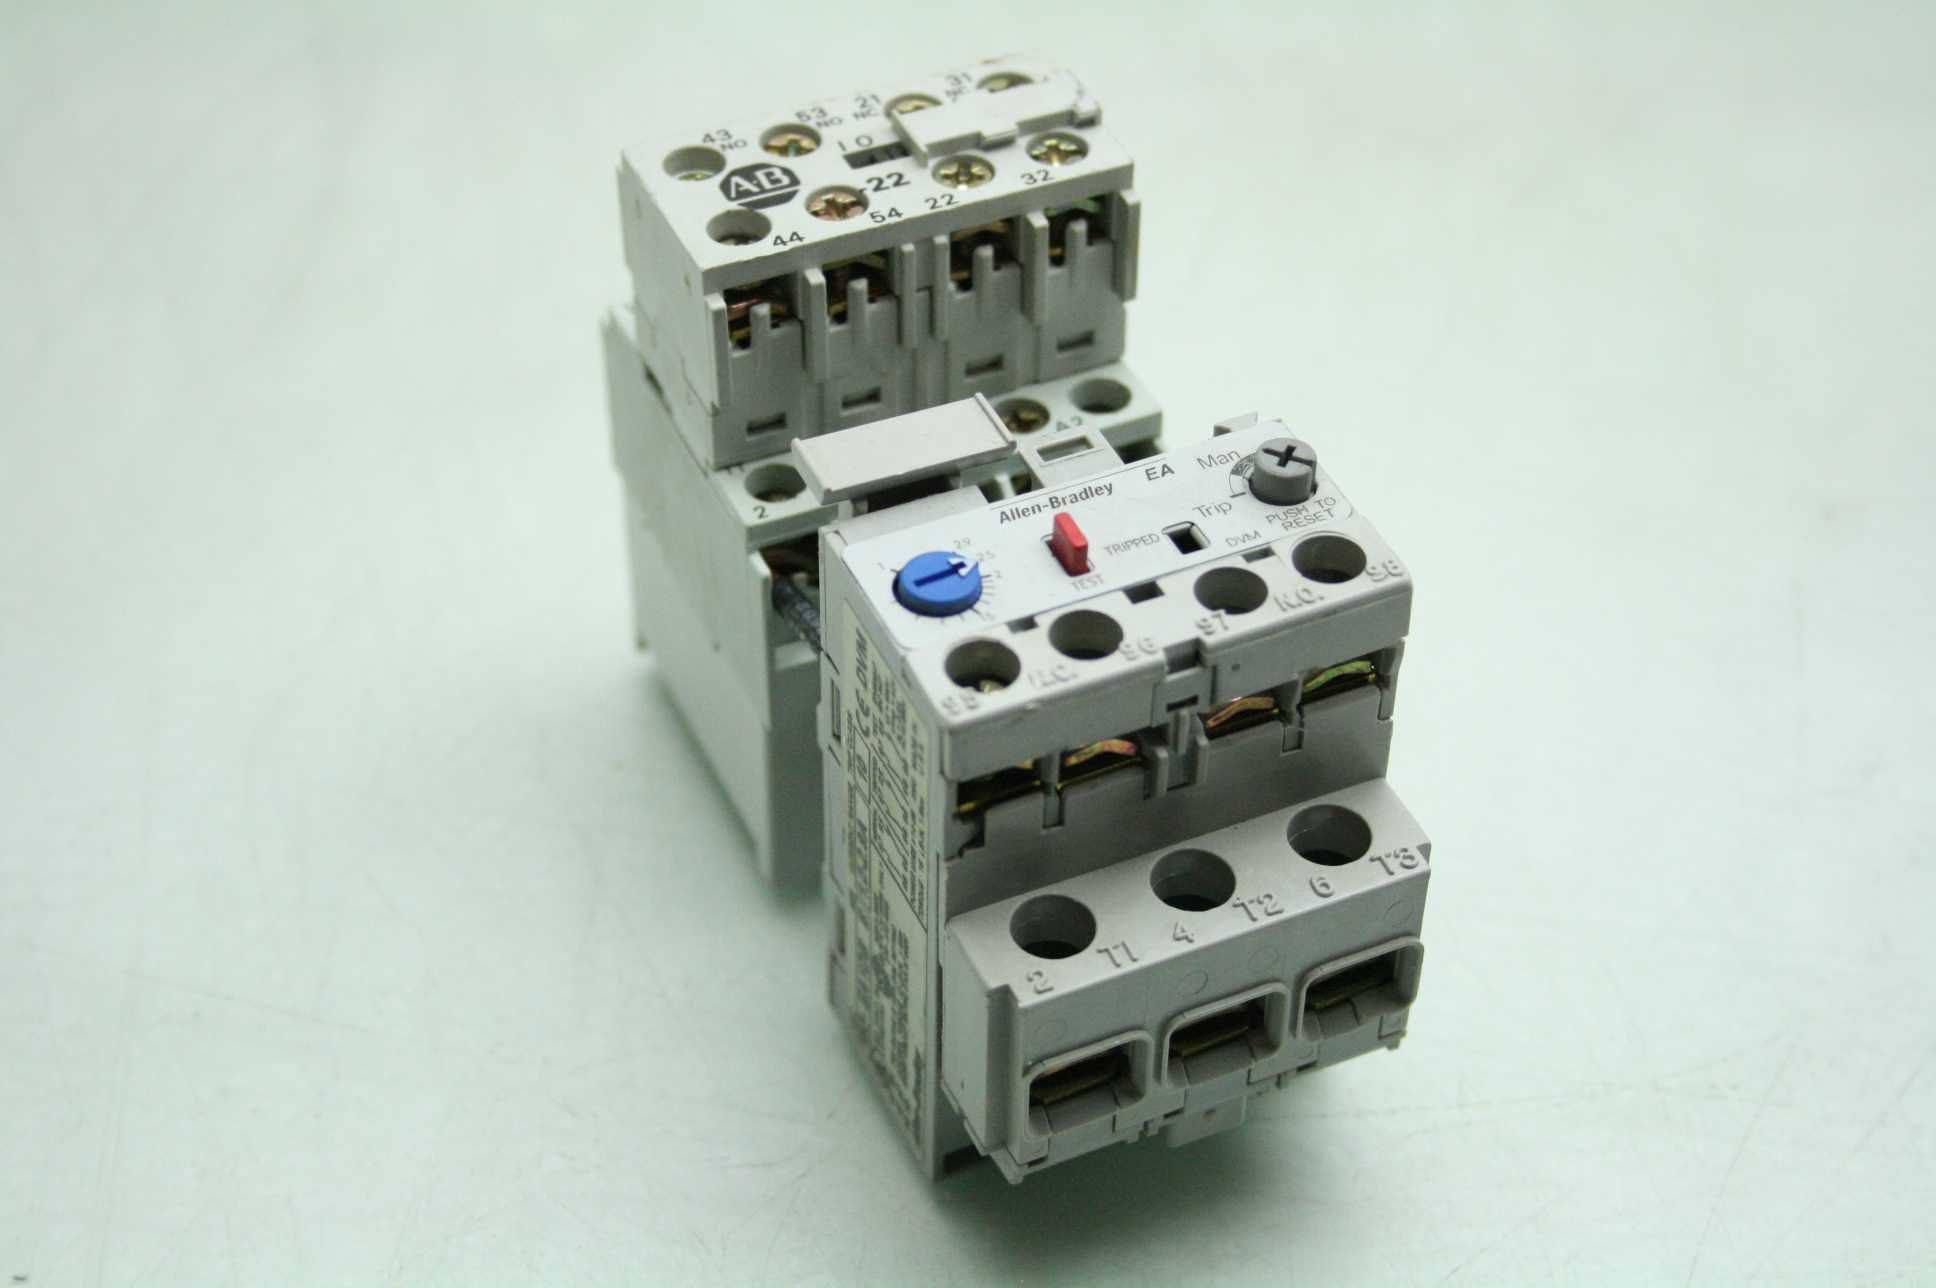 allen bradley safety contactor wiring diagram 2000 gmc safari radio 100 m05n 3 193 ea1d relay 195